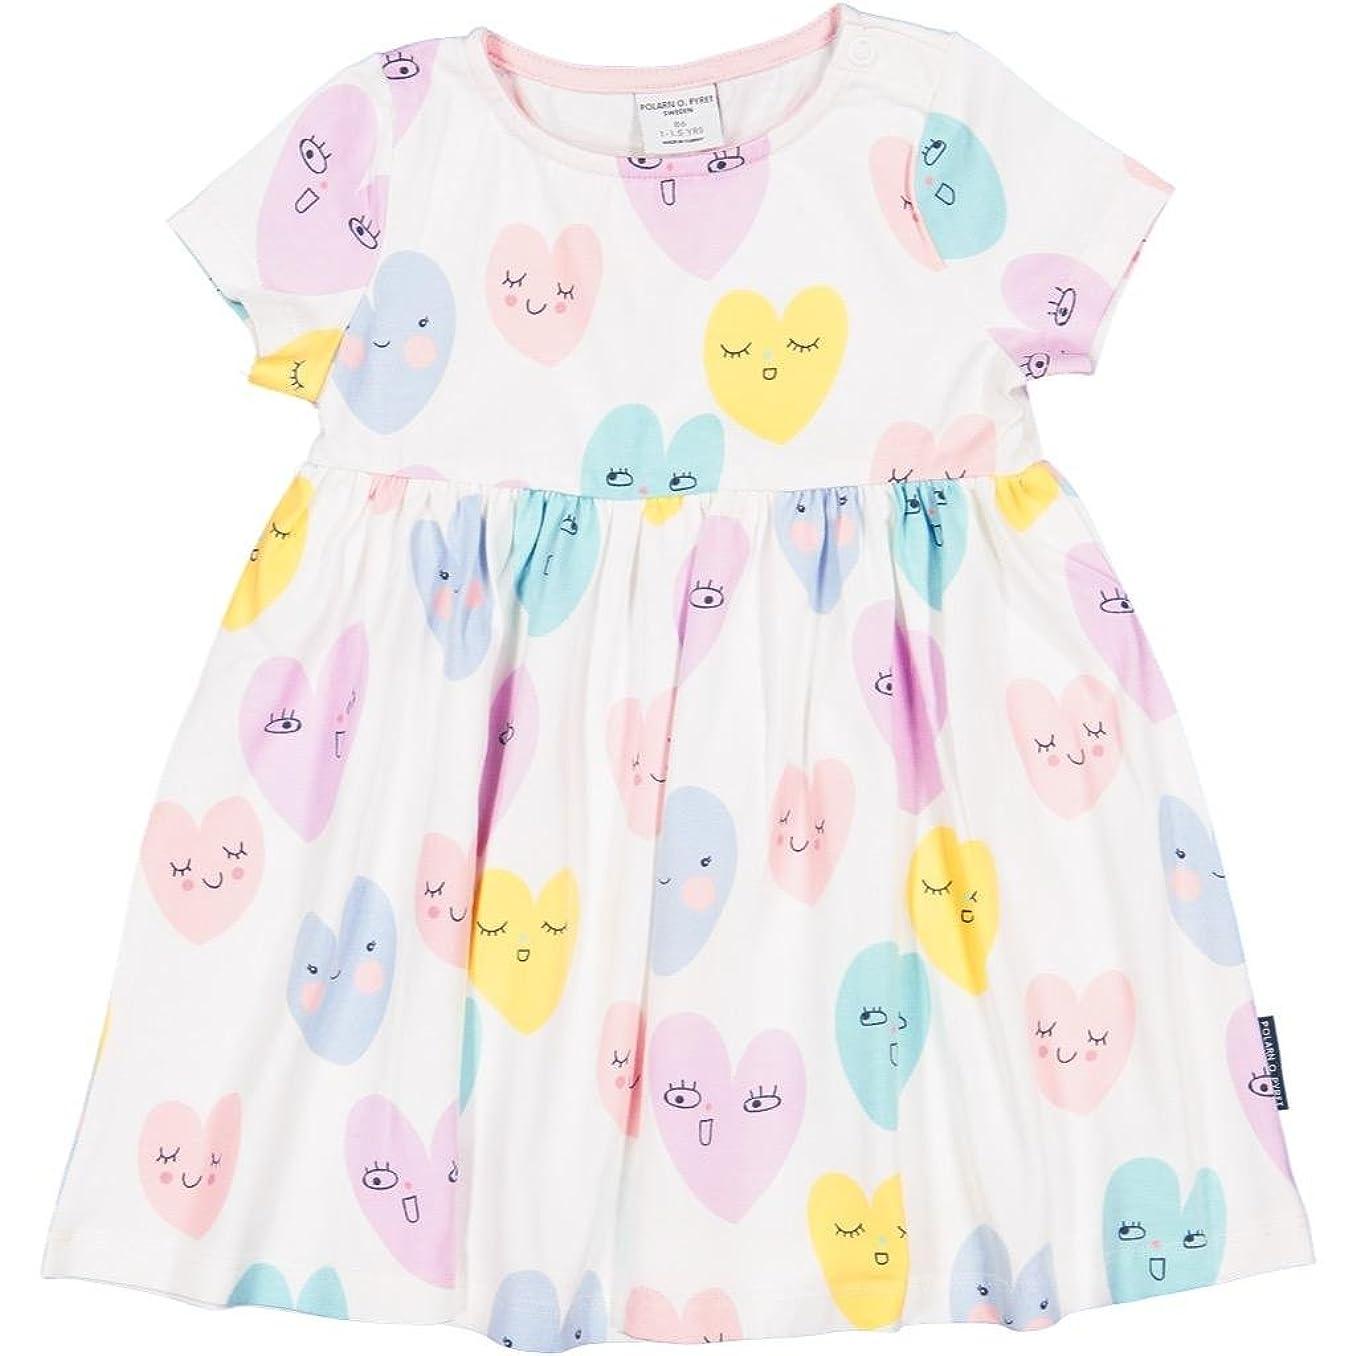 Polarn O. Pyret Winsome Heart Twirl Dress (Baby)